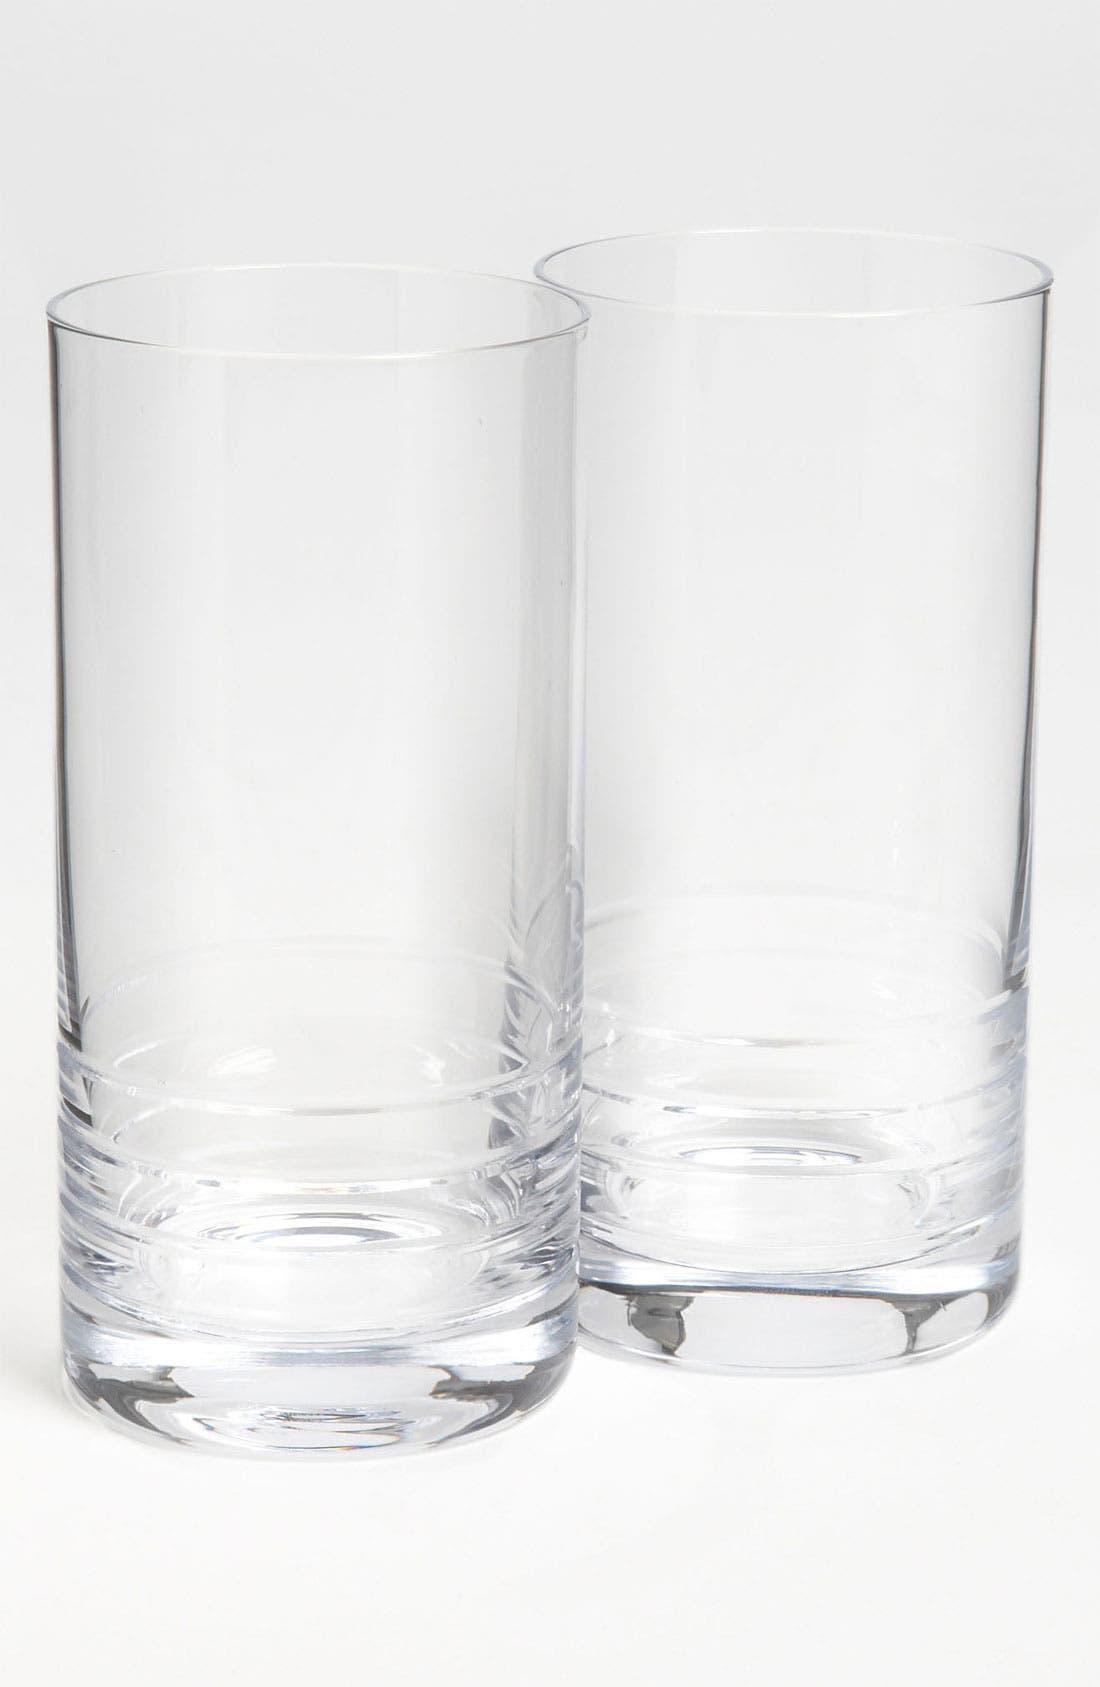 Main Image - kate spade new york 'percival place' highball glasses (Set of 2)